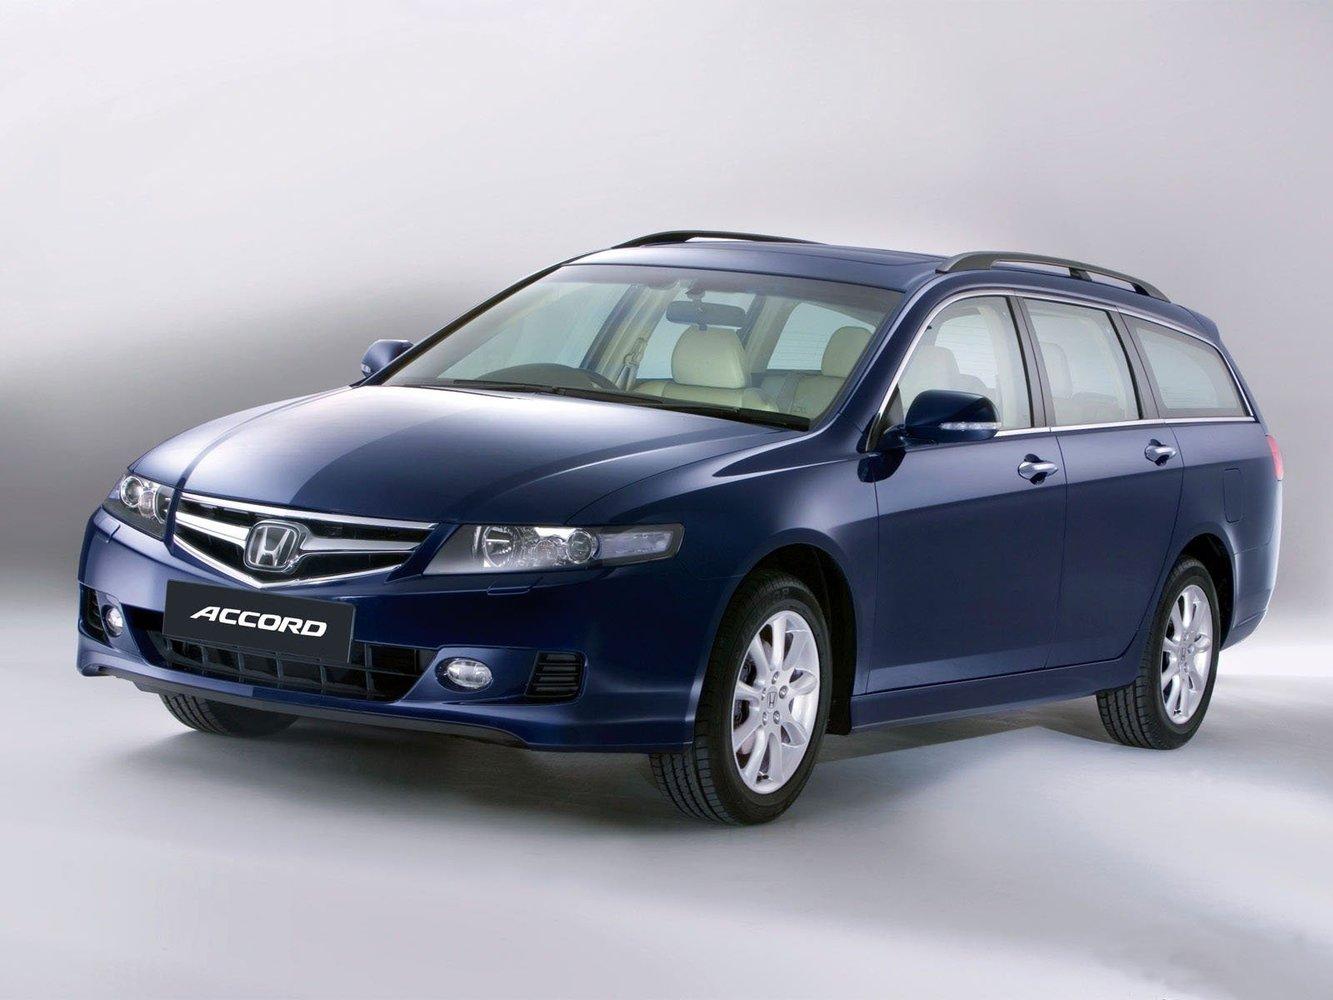 универсал Honda Accord